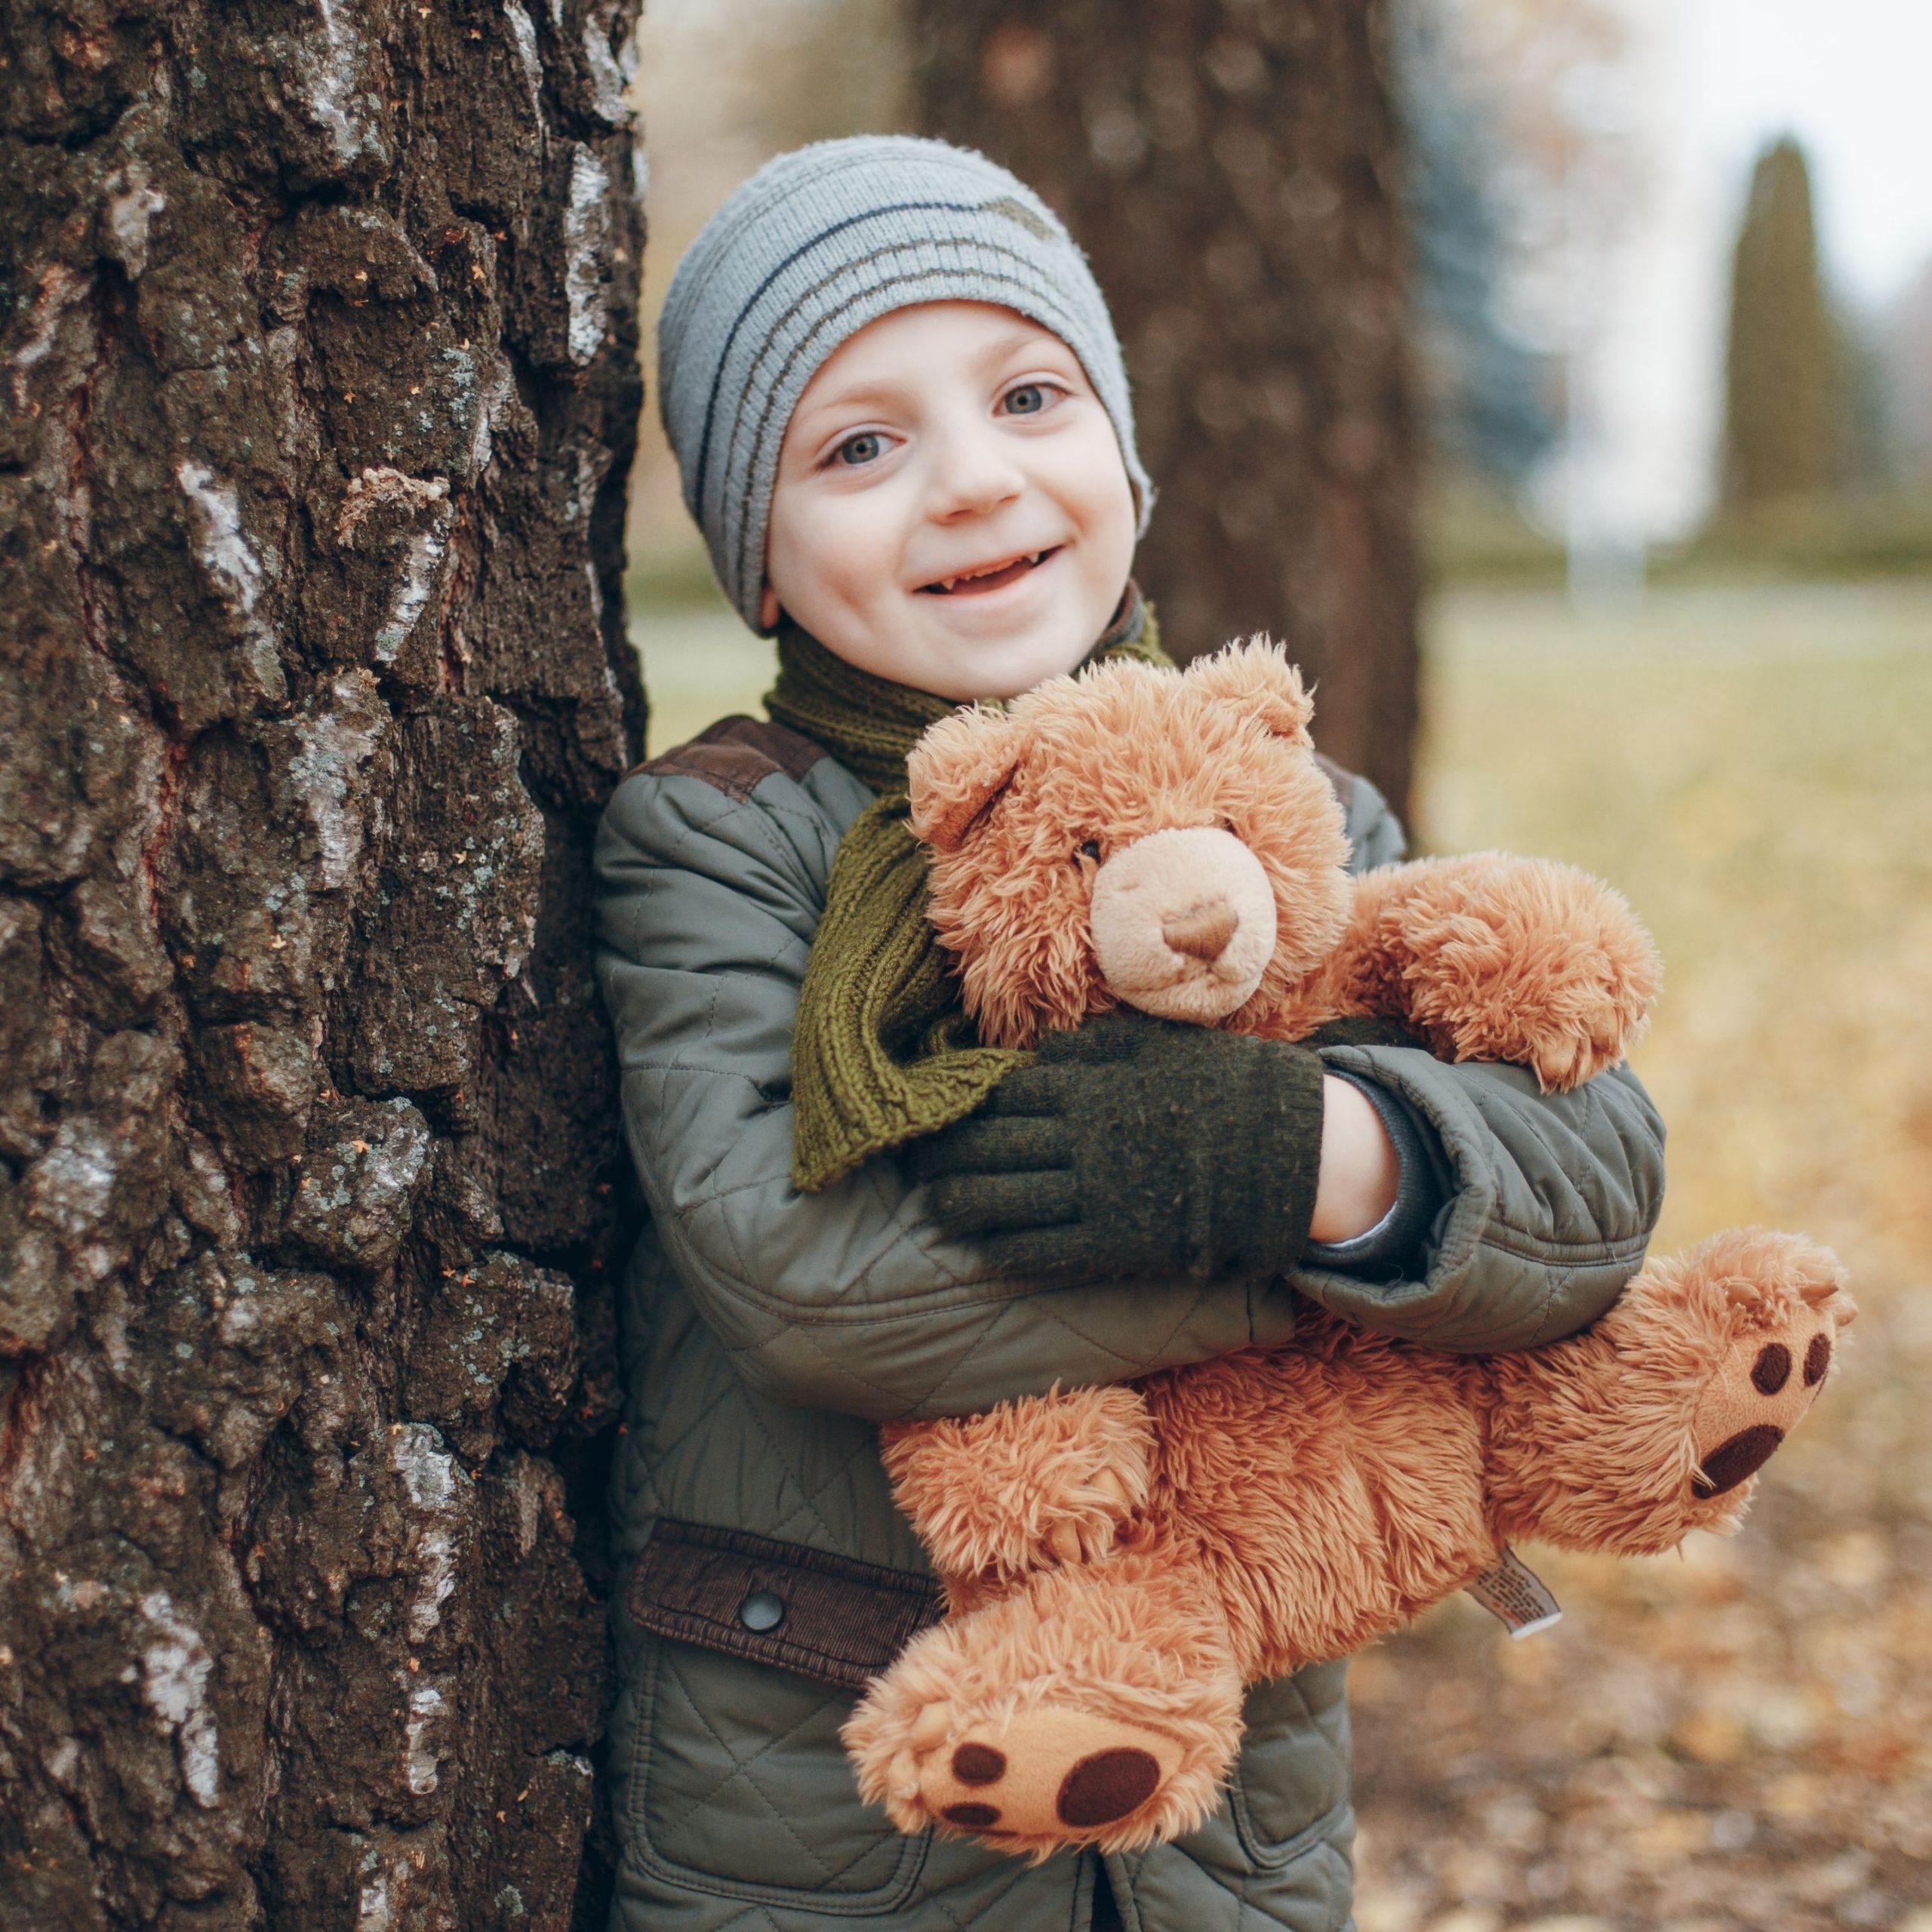 Charities for Handmade Bears